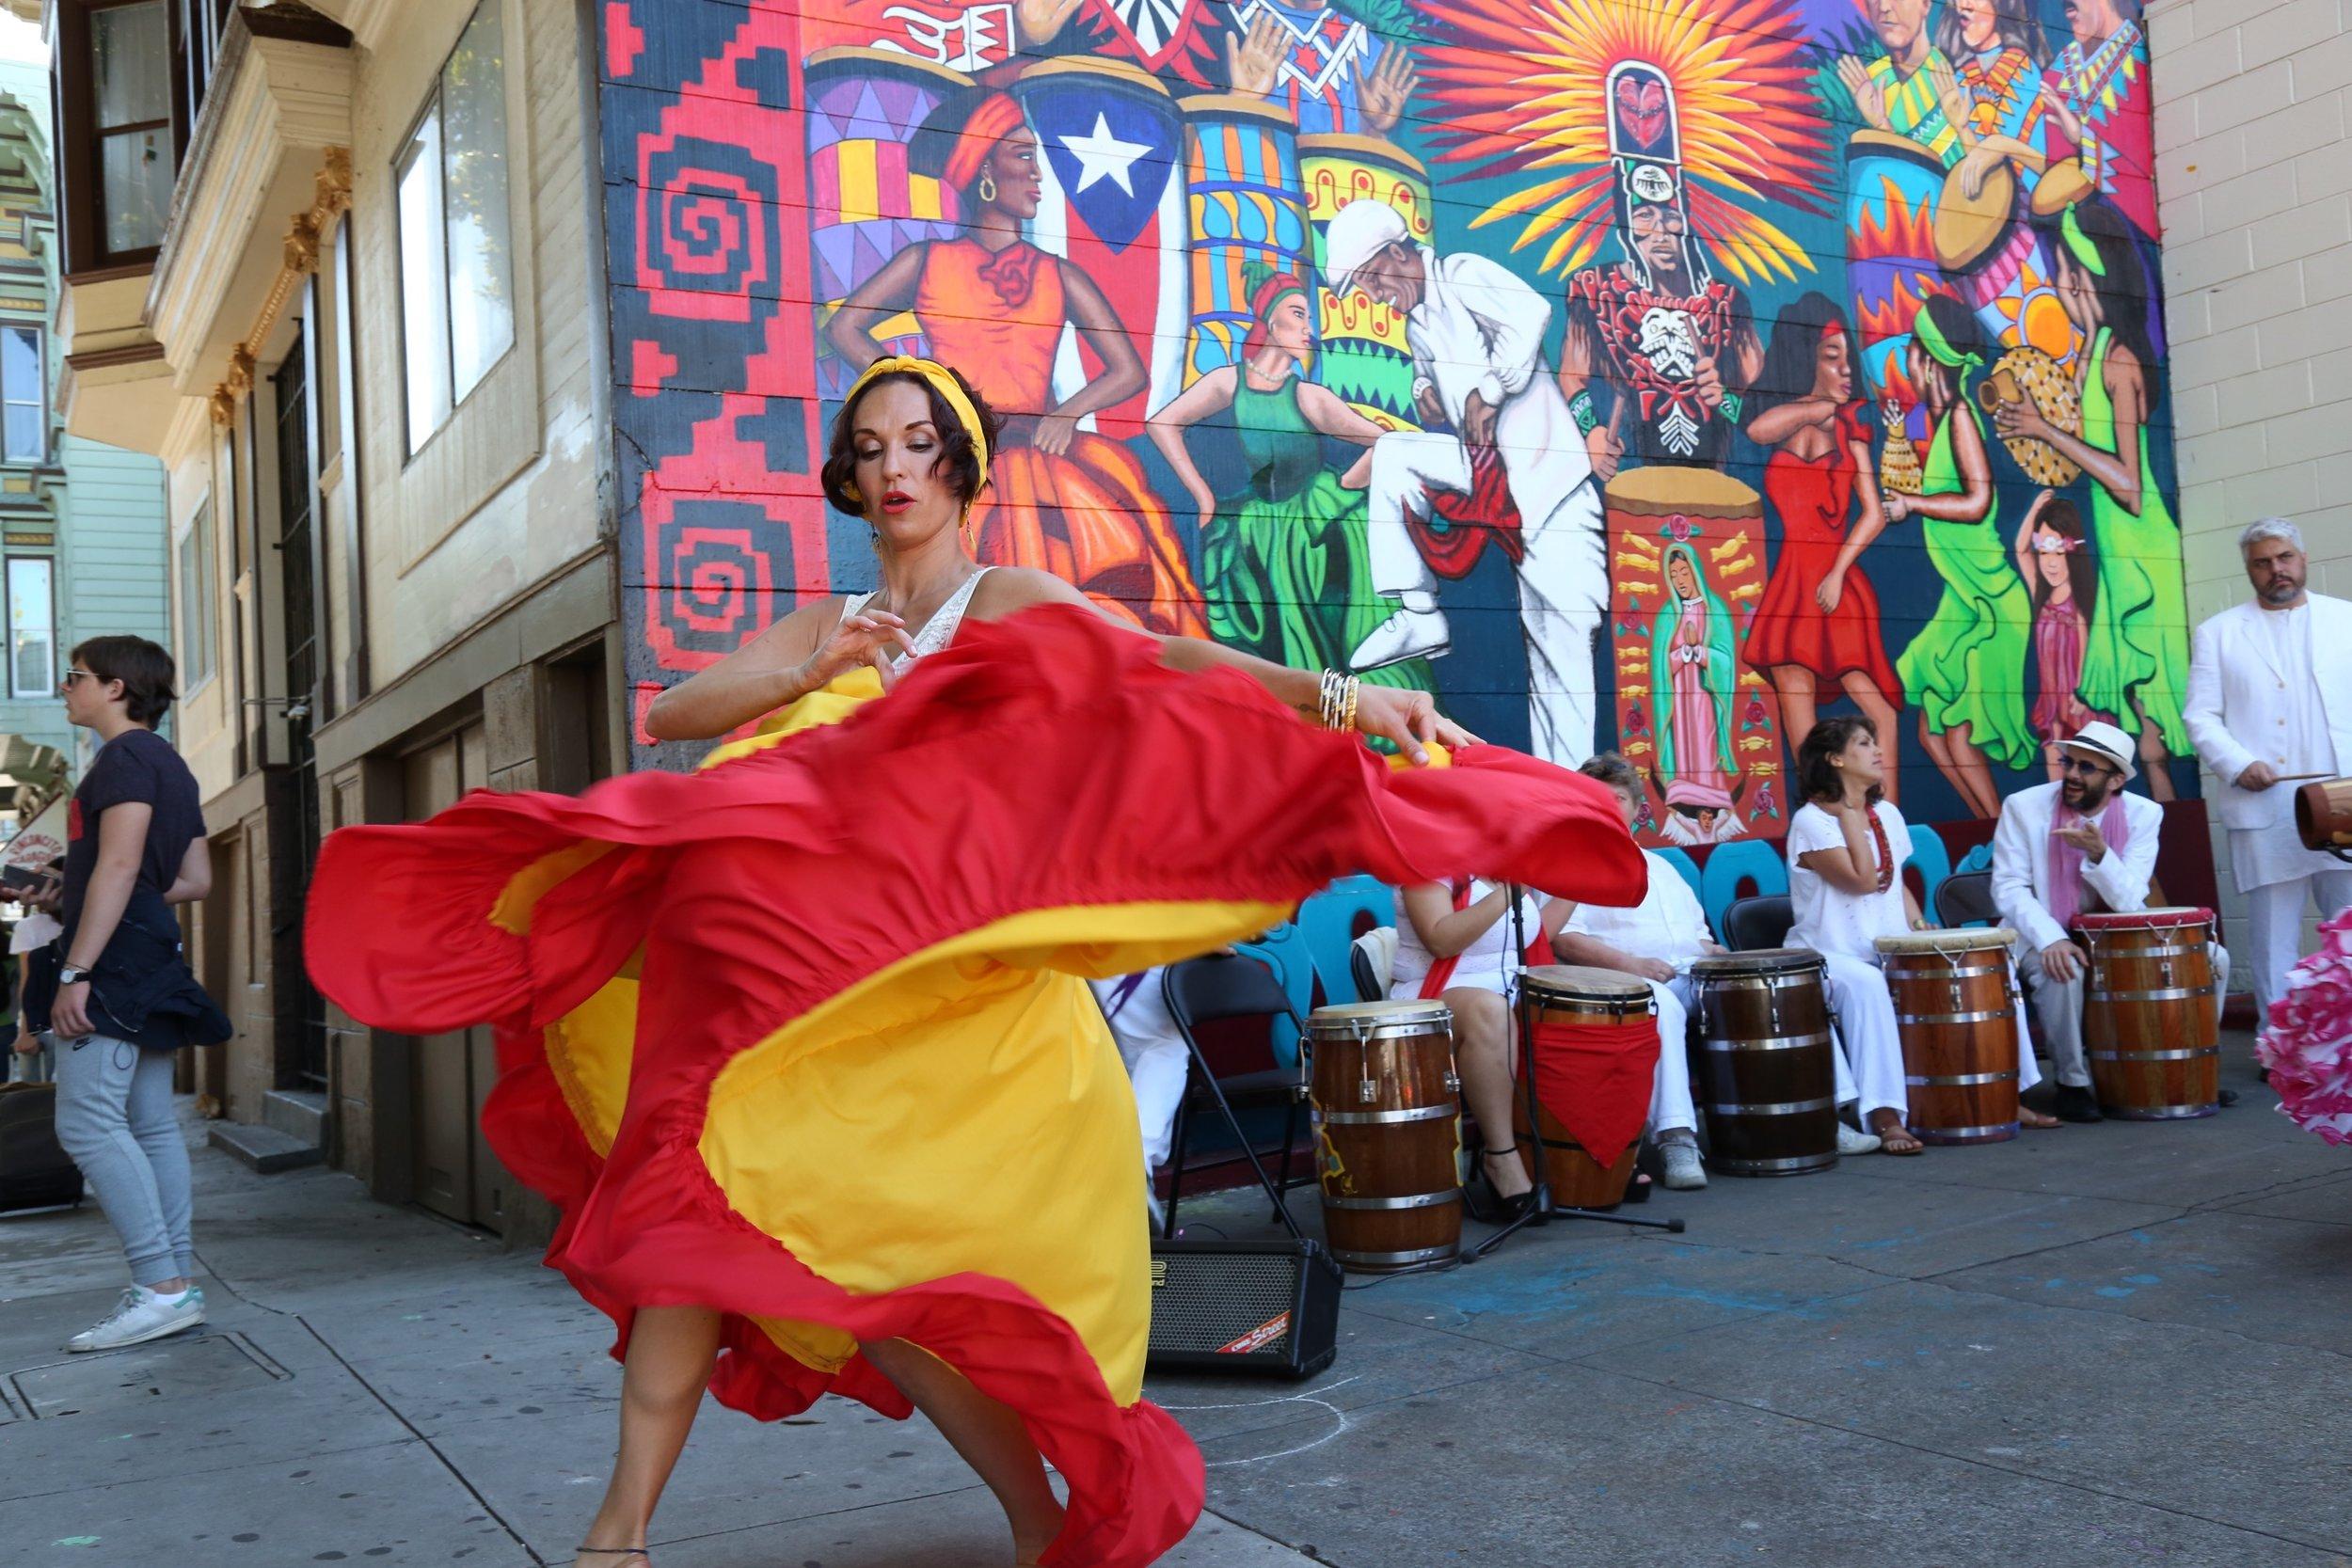 TBTiffanyDance1.May 2016 Baile en la Calle.jpeg